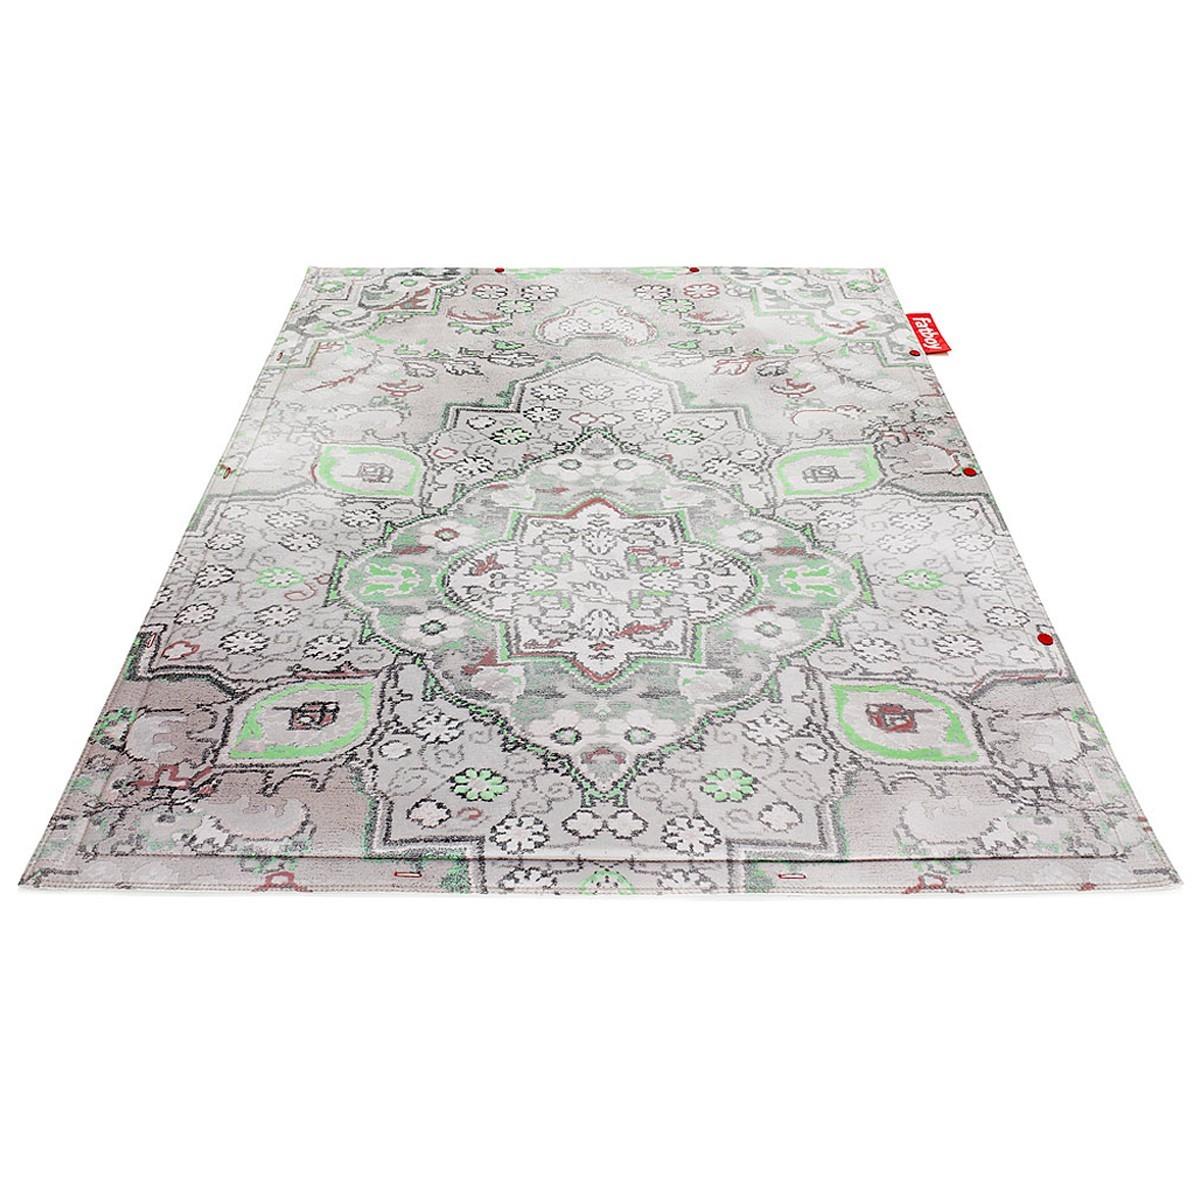 Tapis non flying carpet de fatboy - Lyon tapis vert ...